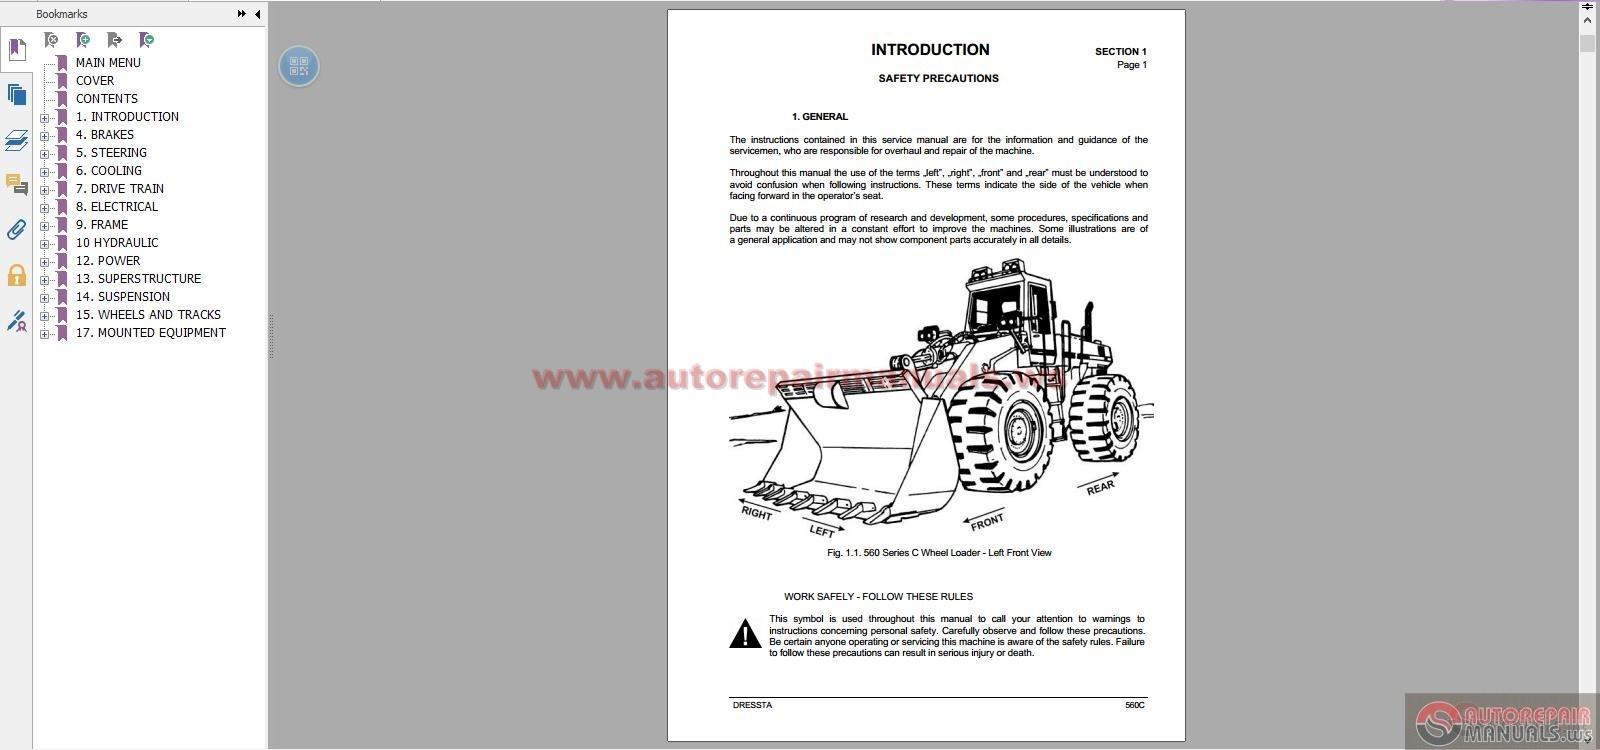 Komatsu wheel loaders all shop manual auto repair manual forum img sciox Gallery